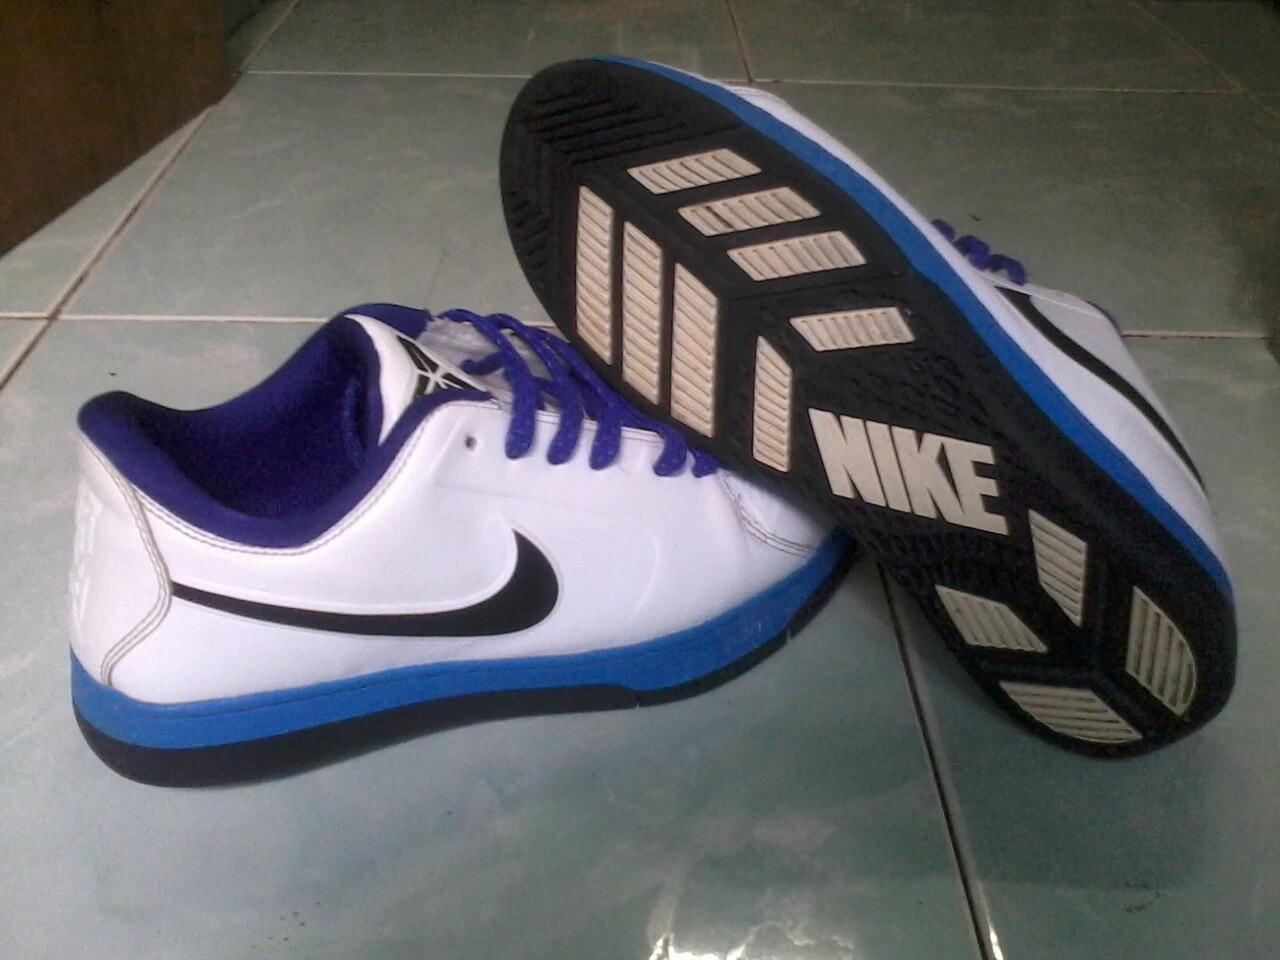 ... where to buy tips mengetahui sepatu nike dan adidas original asli atau  palsu kw 4f6b0 fef12 67436c793f